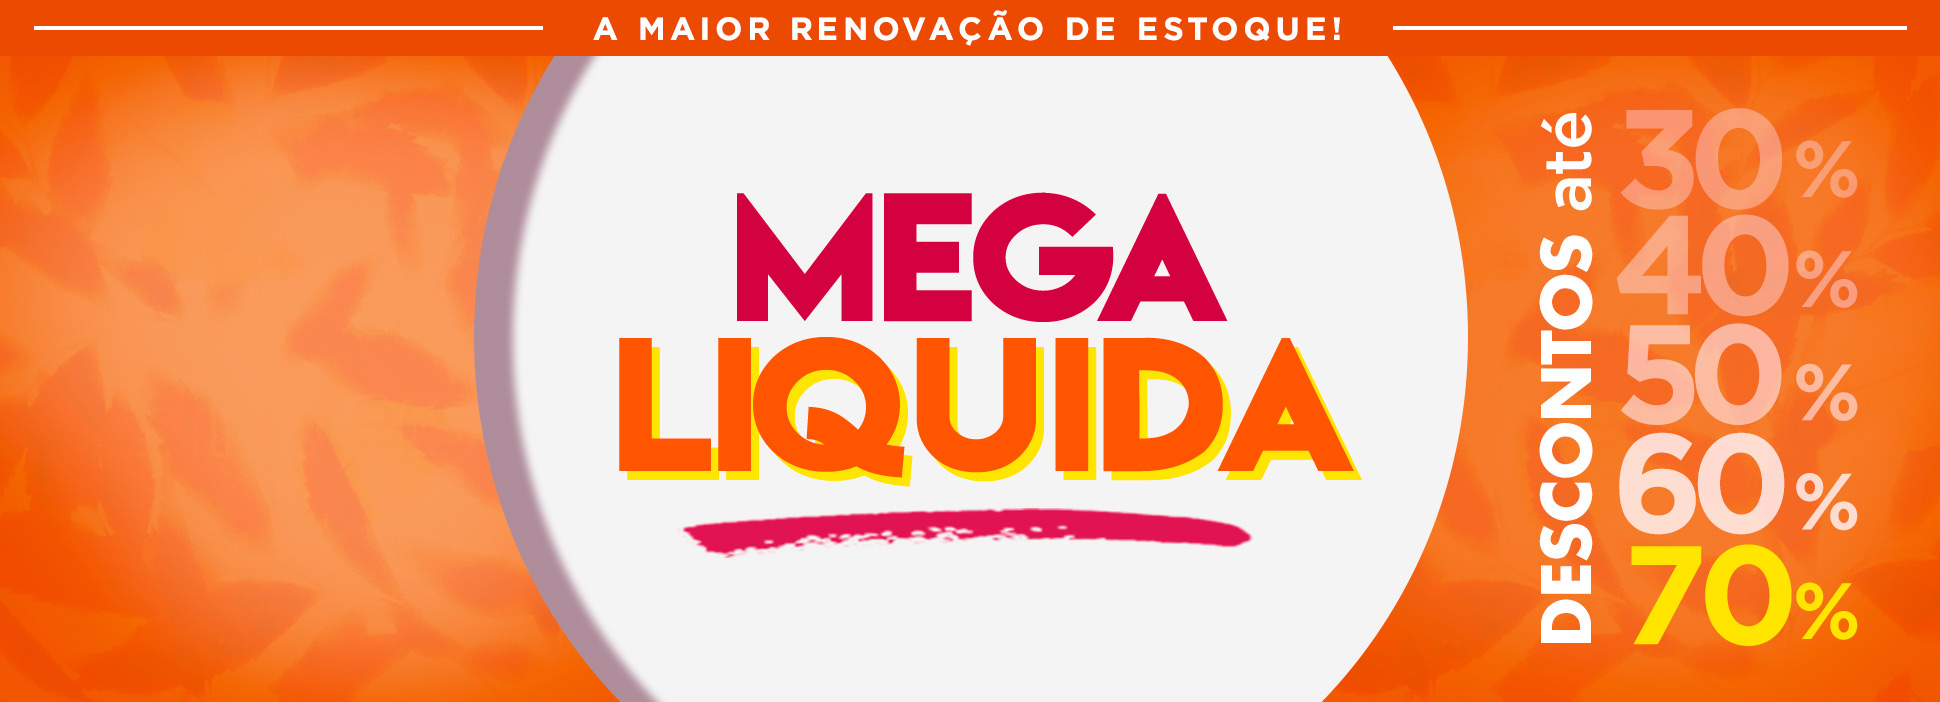 Mega Liquida da Beleza na Web